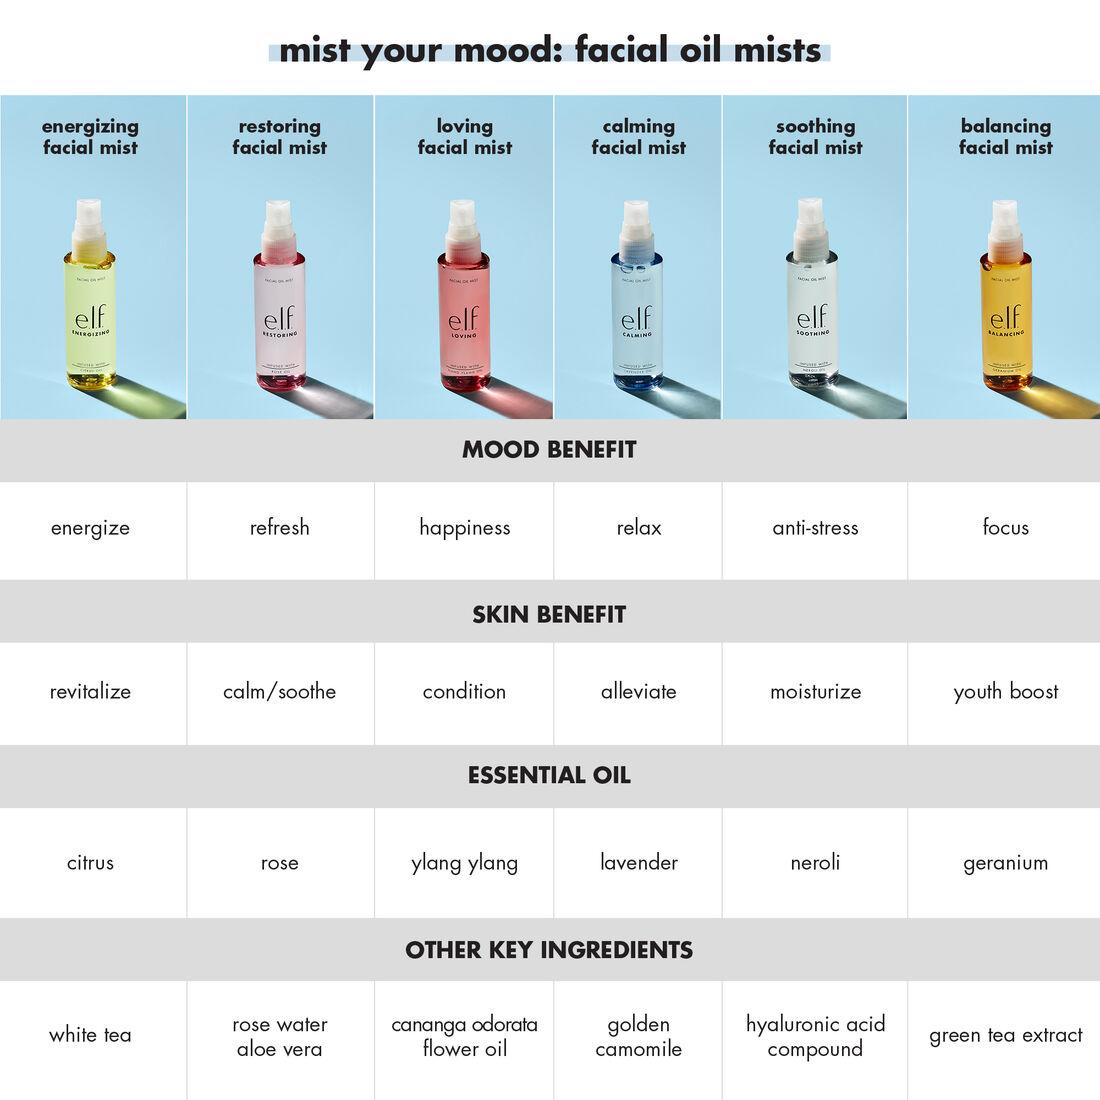 ELF Facial Oil Mist Collection